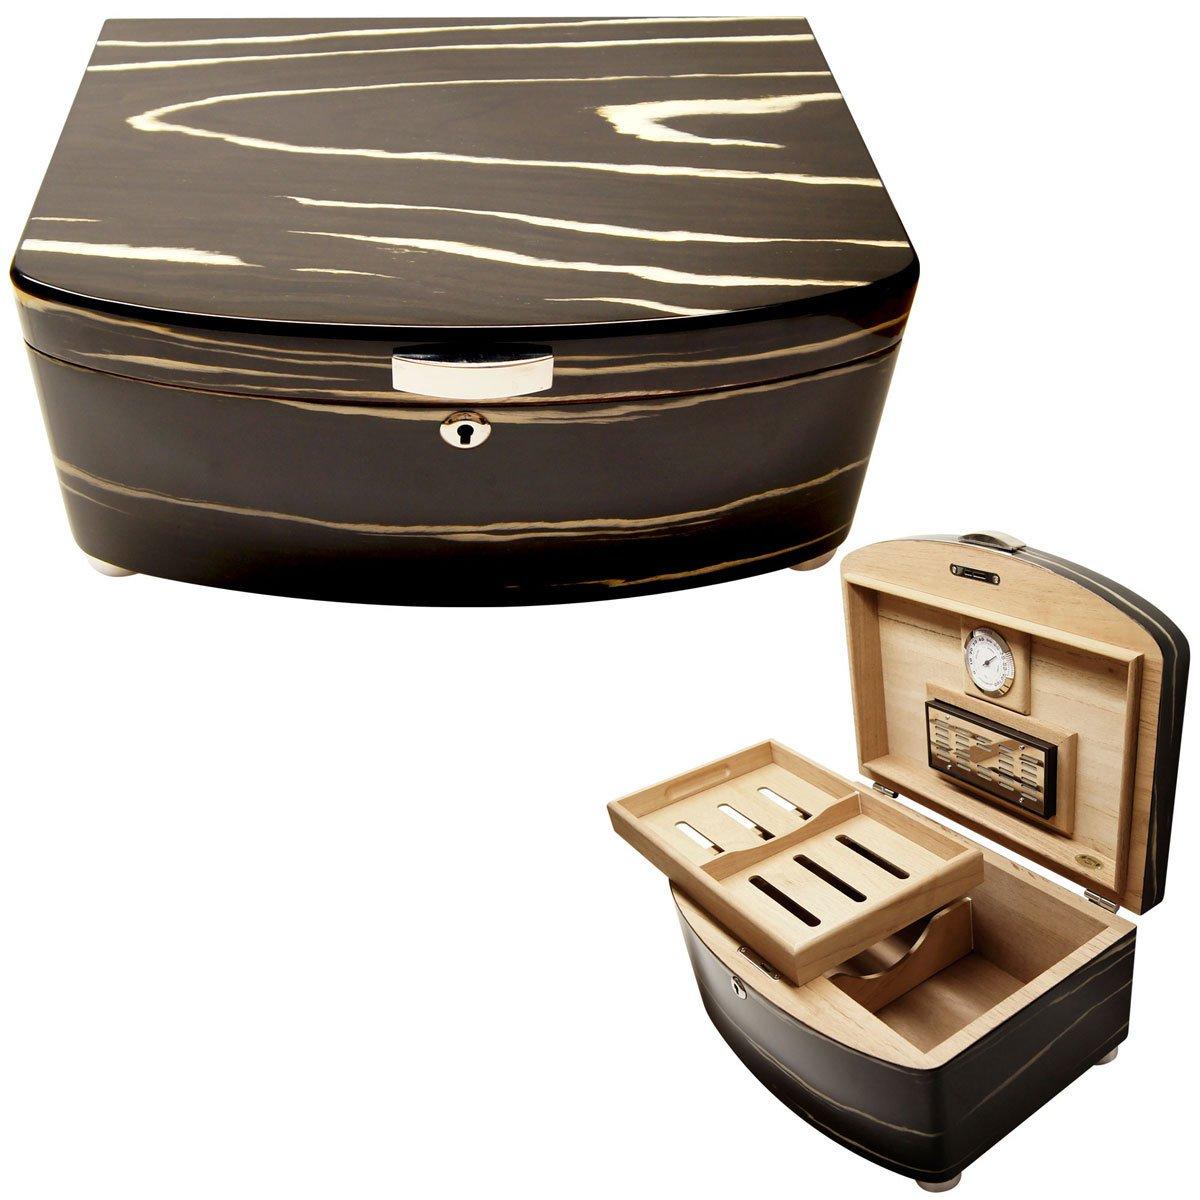 New Cuban Crafters Exclusivo Black 100 Count Spanish Cedar Lined Cigar Humidor